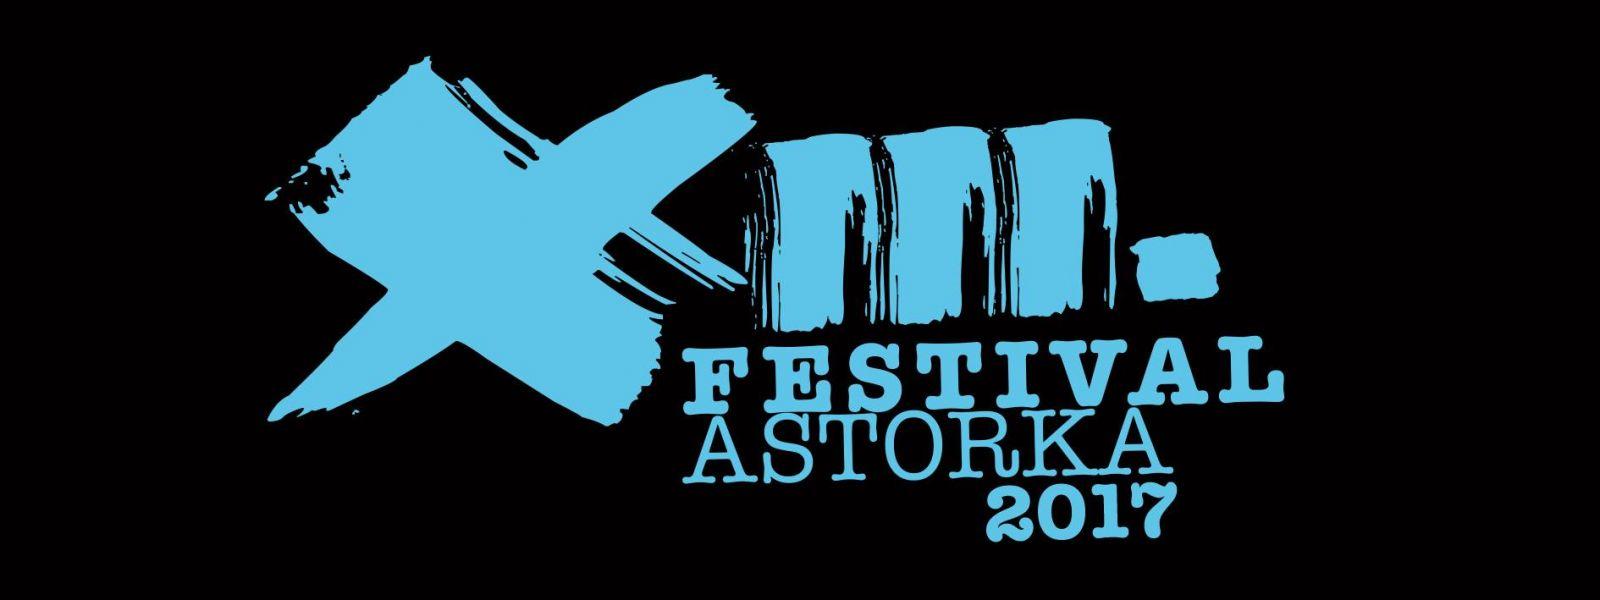 Festival Astorka 2017